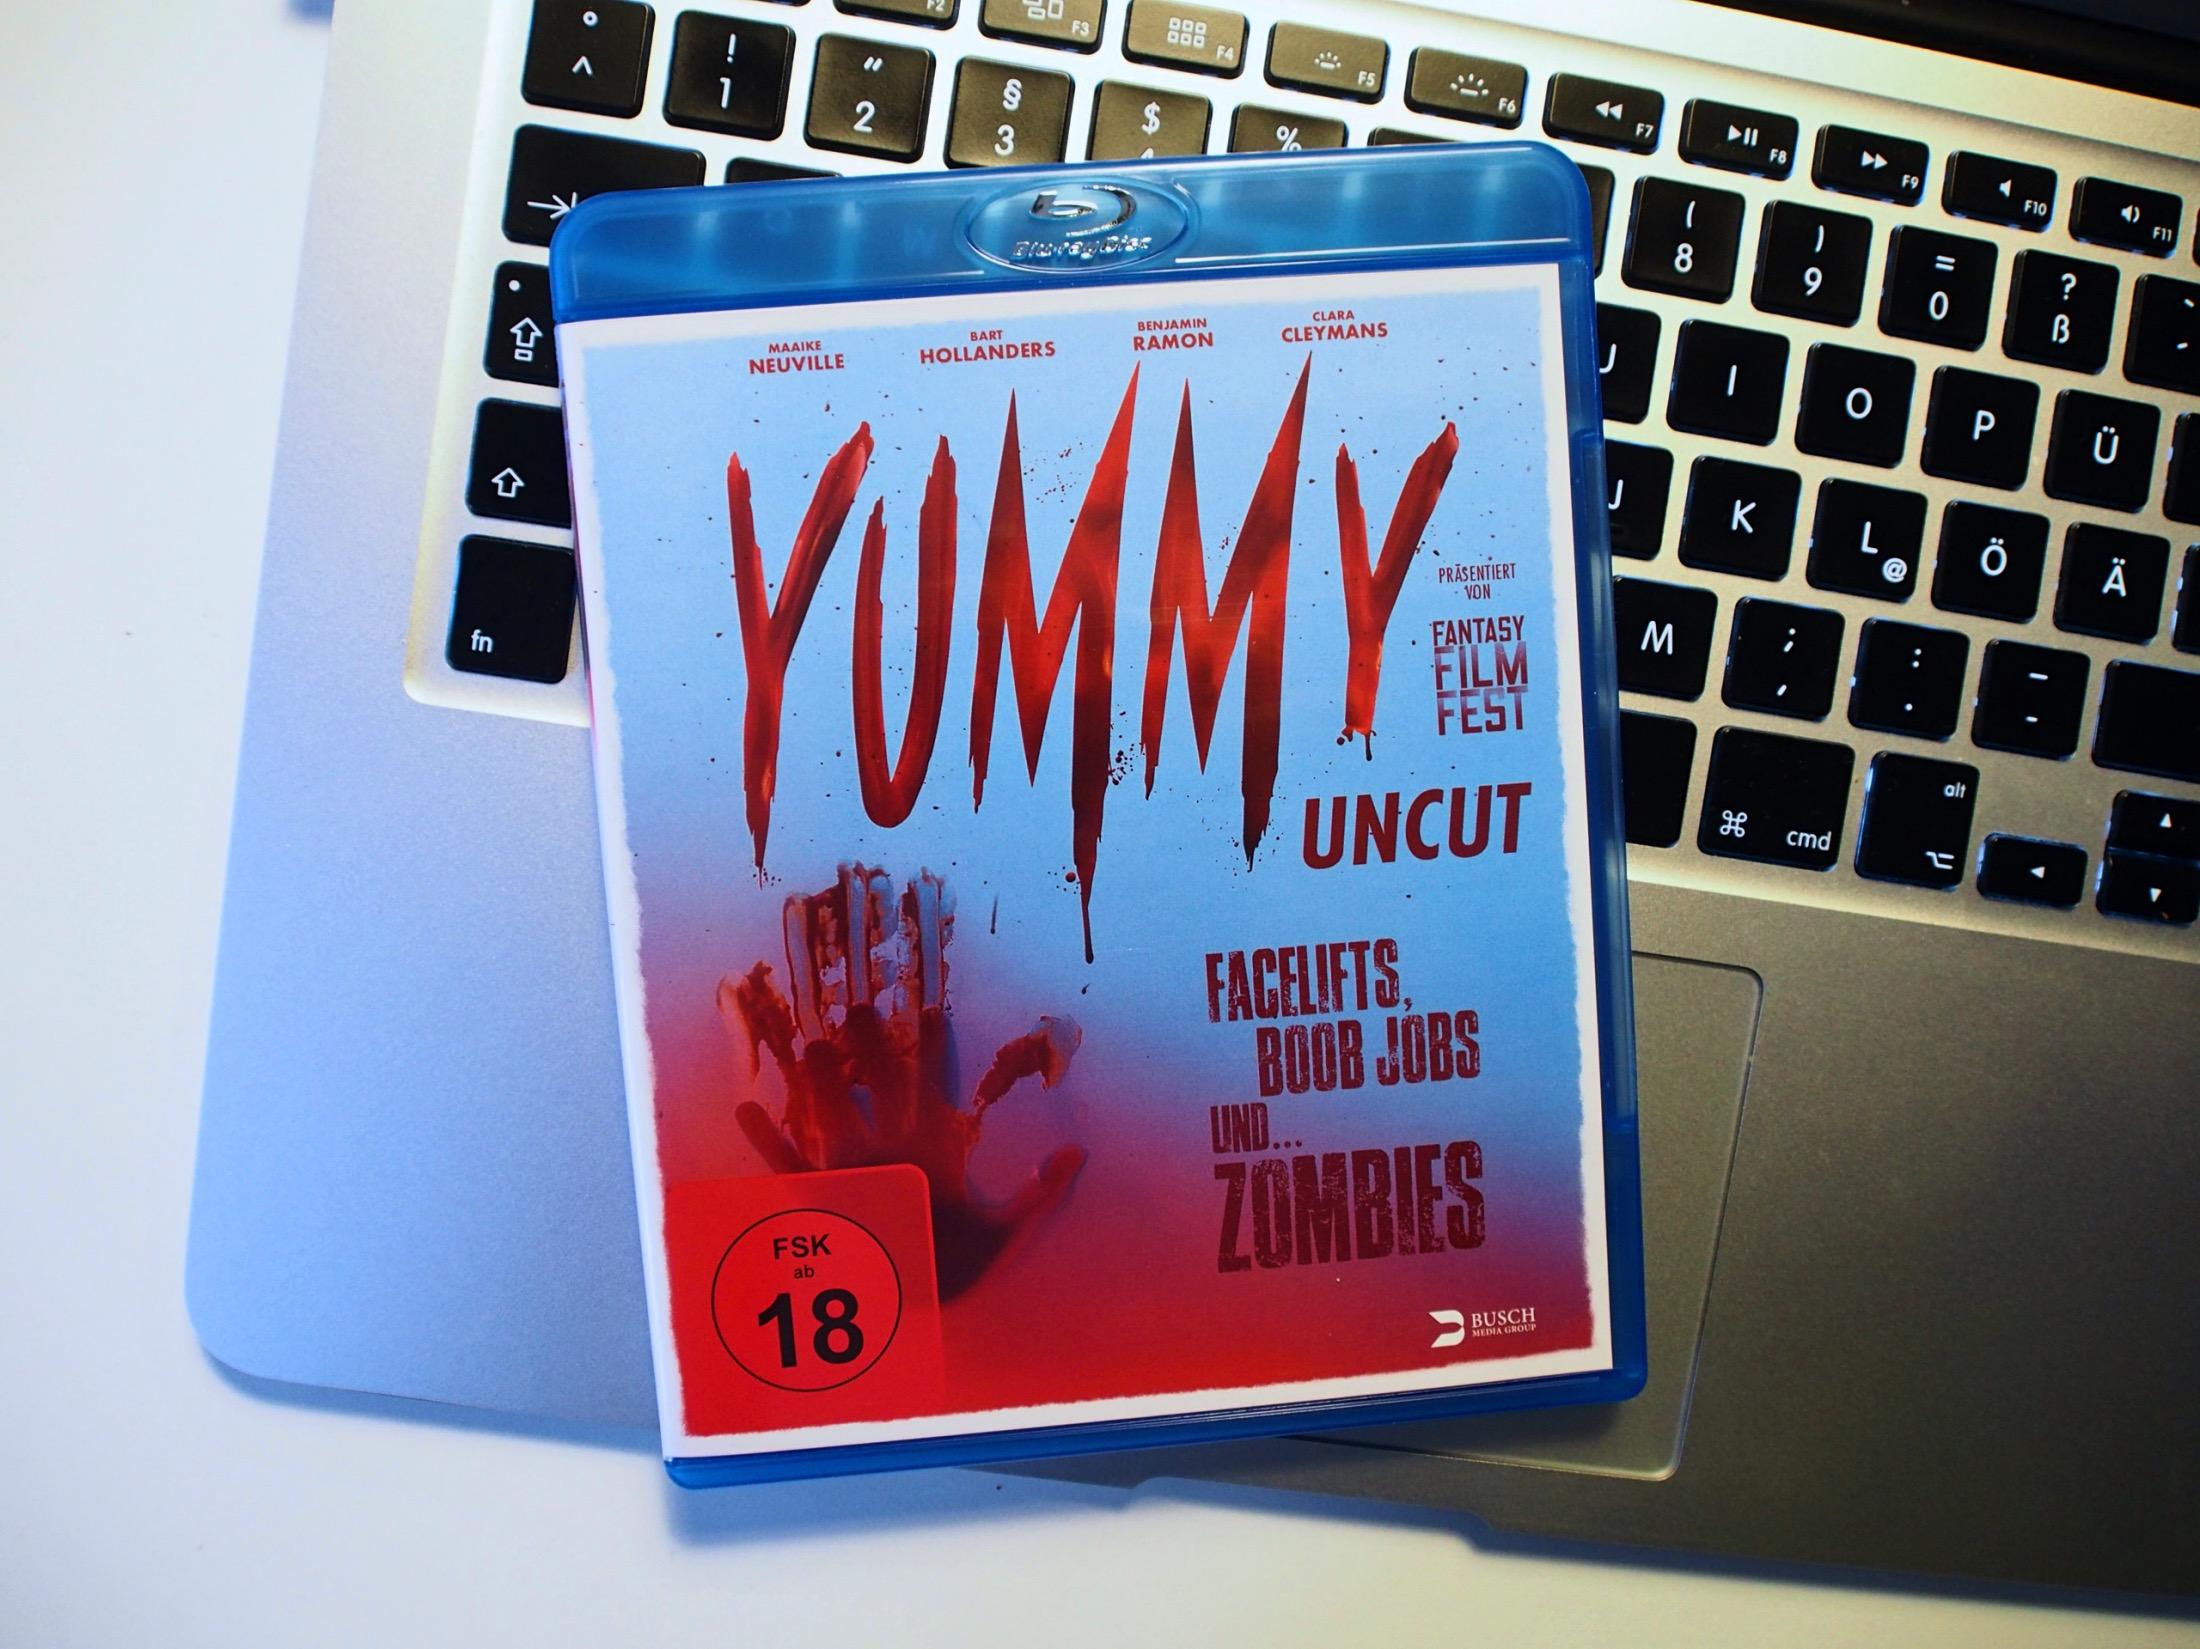 Yummy Uncut